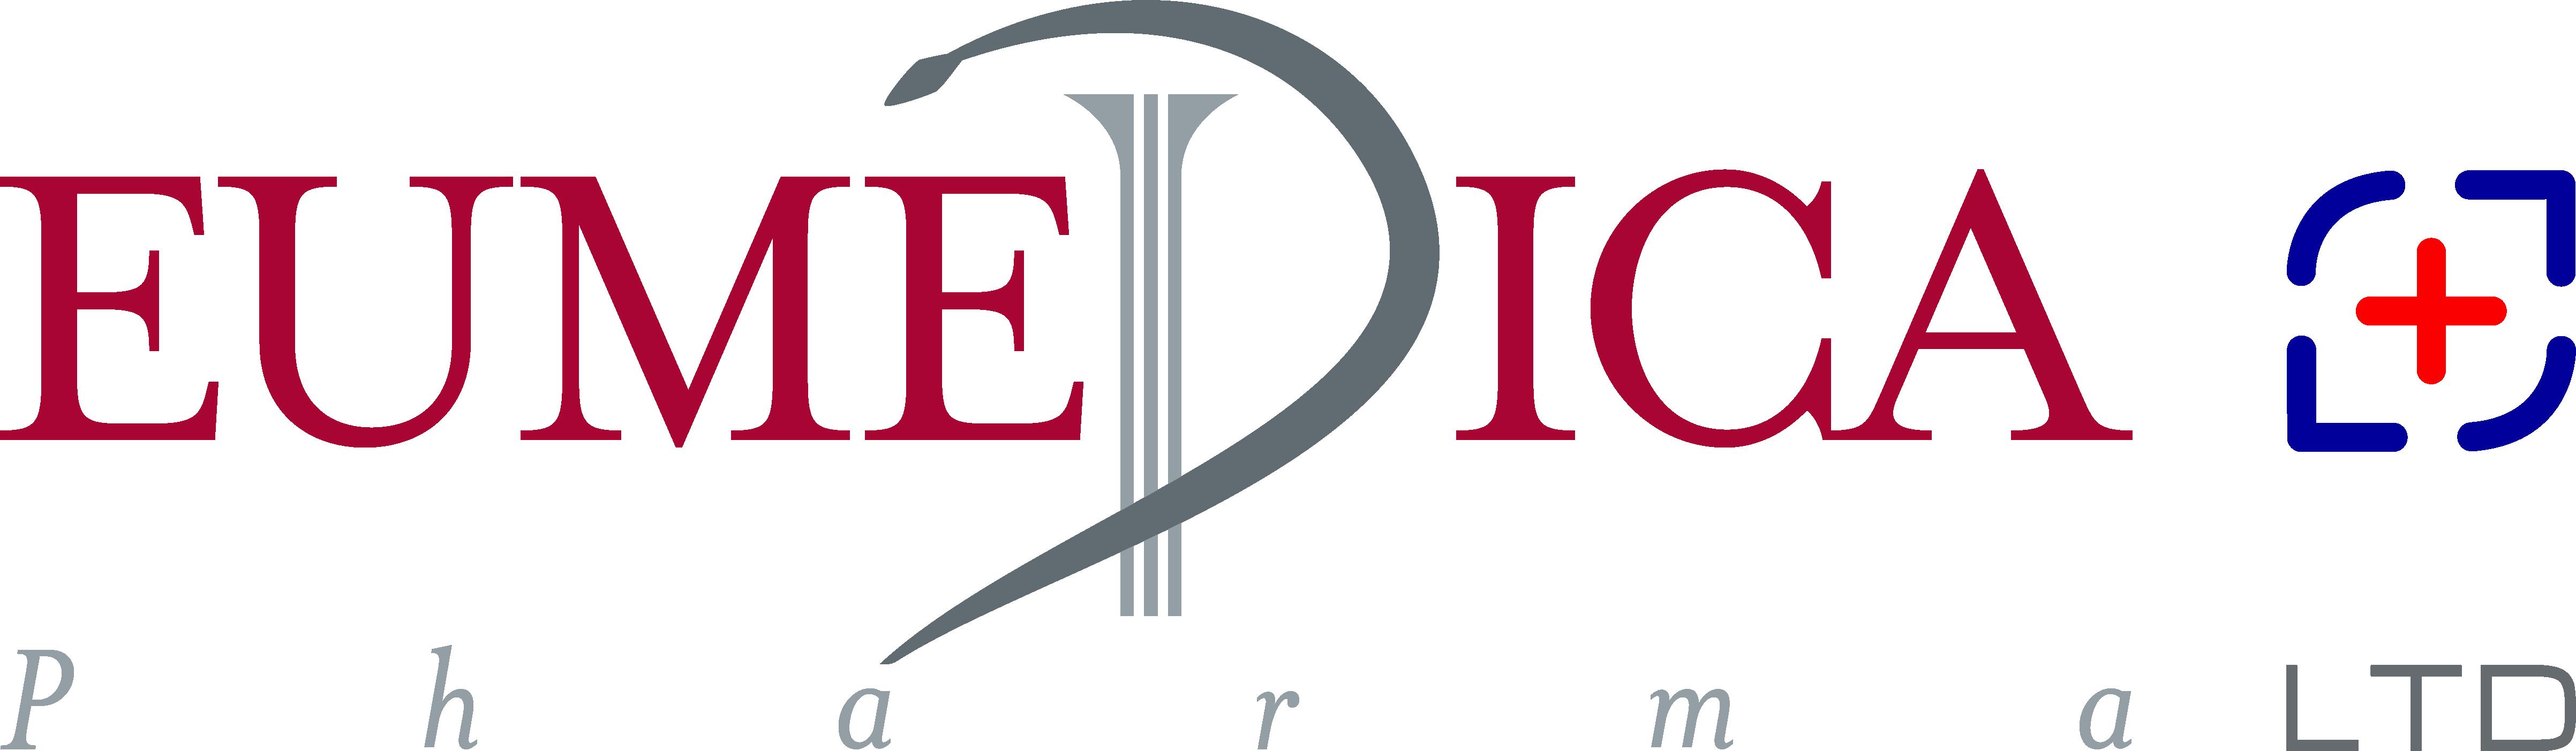 Eumedica Pharma Ltd - logo